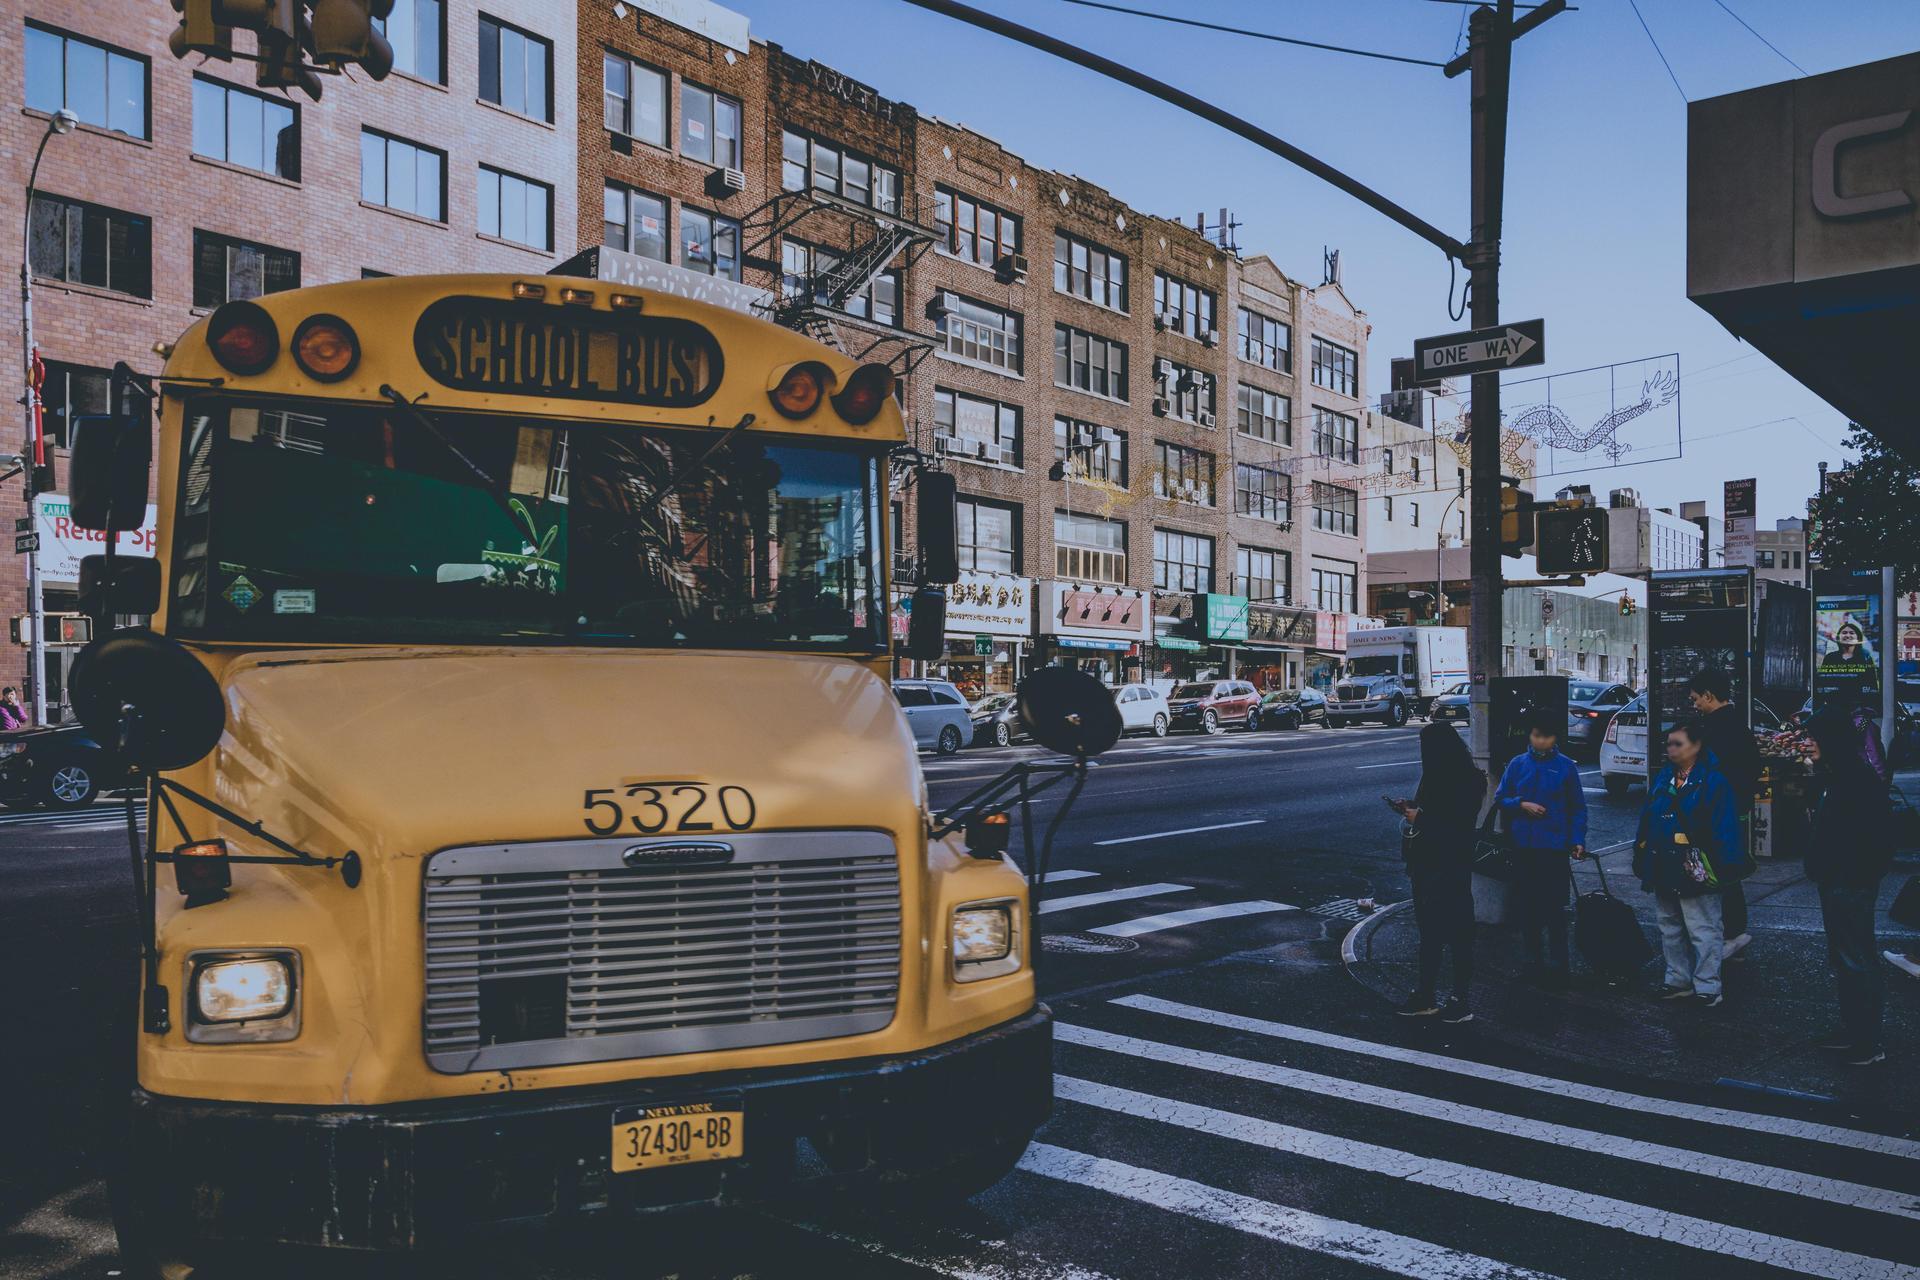 Yellow school bus on city street